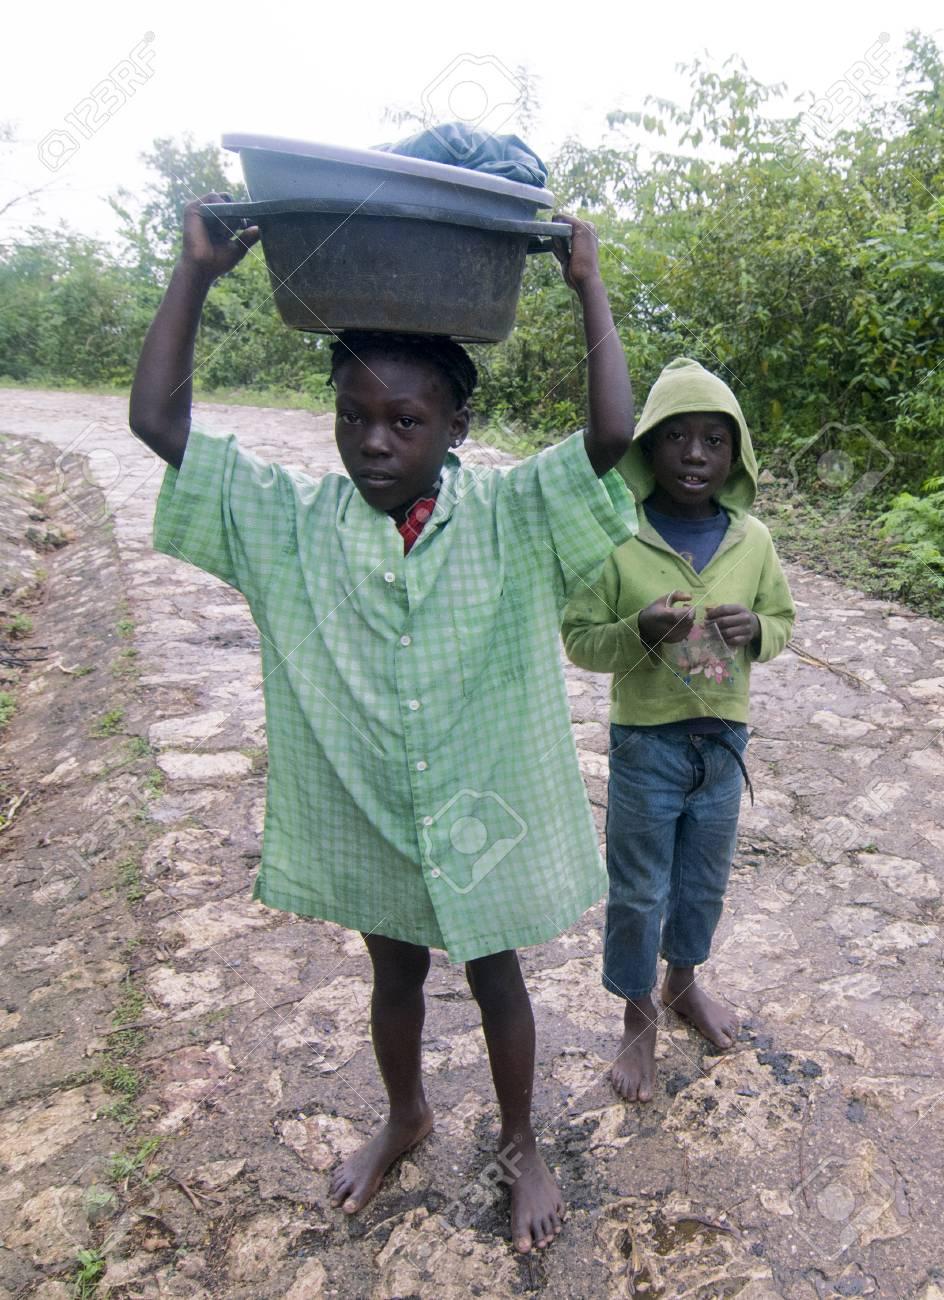 MILOT, HAITI - NOV 17, Unidentified Haitian kids carrying their goods on a steep mountain road on November 17, 2013 in Milot, Haiti Stock Photo - 24270312